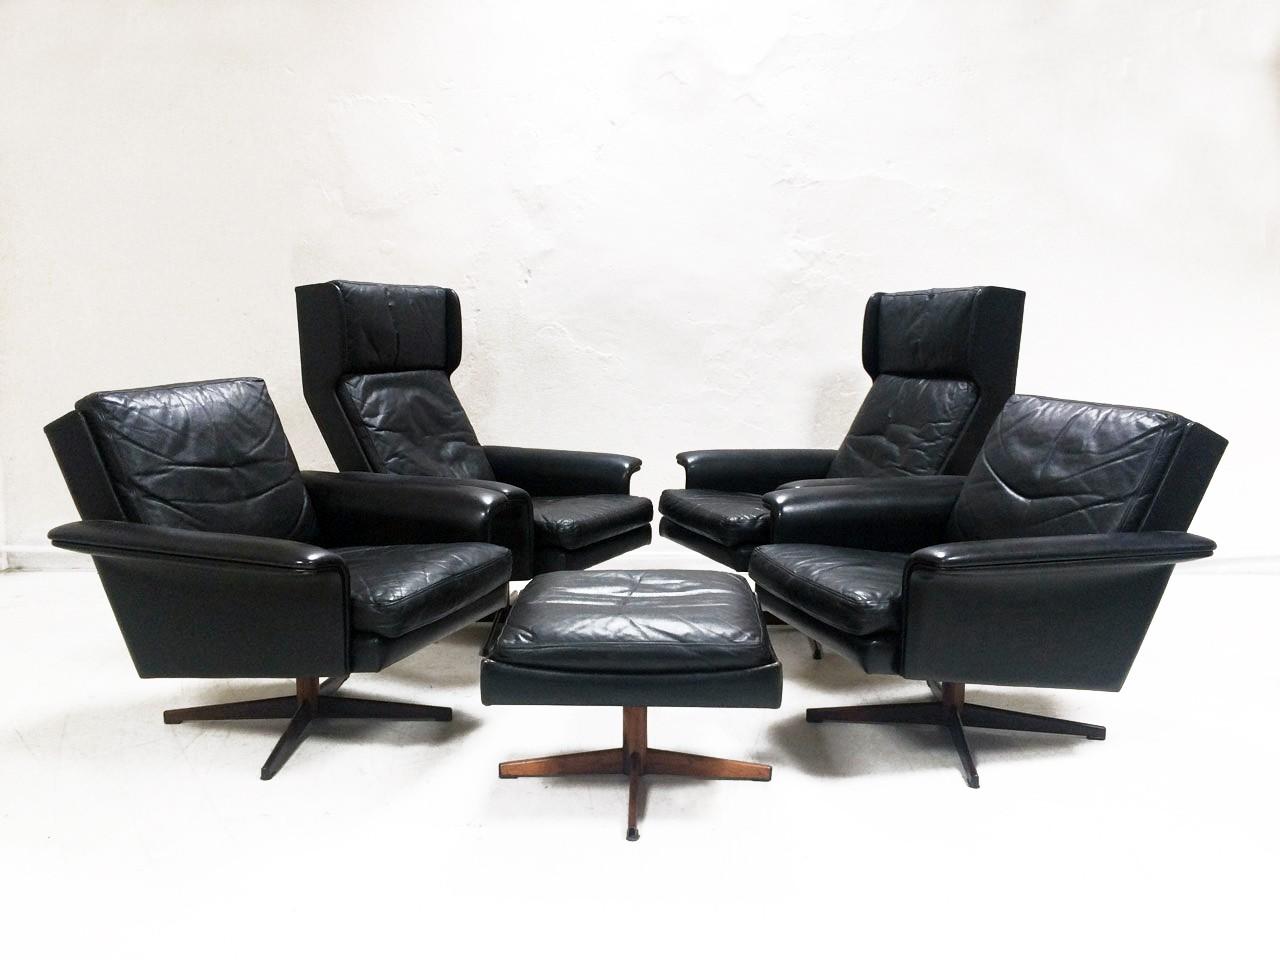 Living room set in black leather by HW Klein for Komfort - 1960s ...